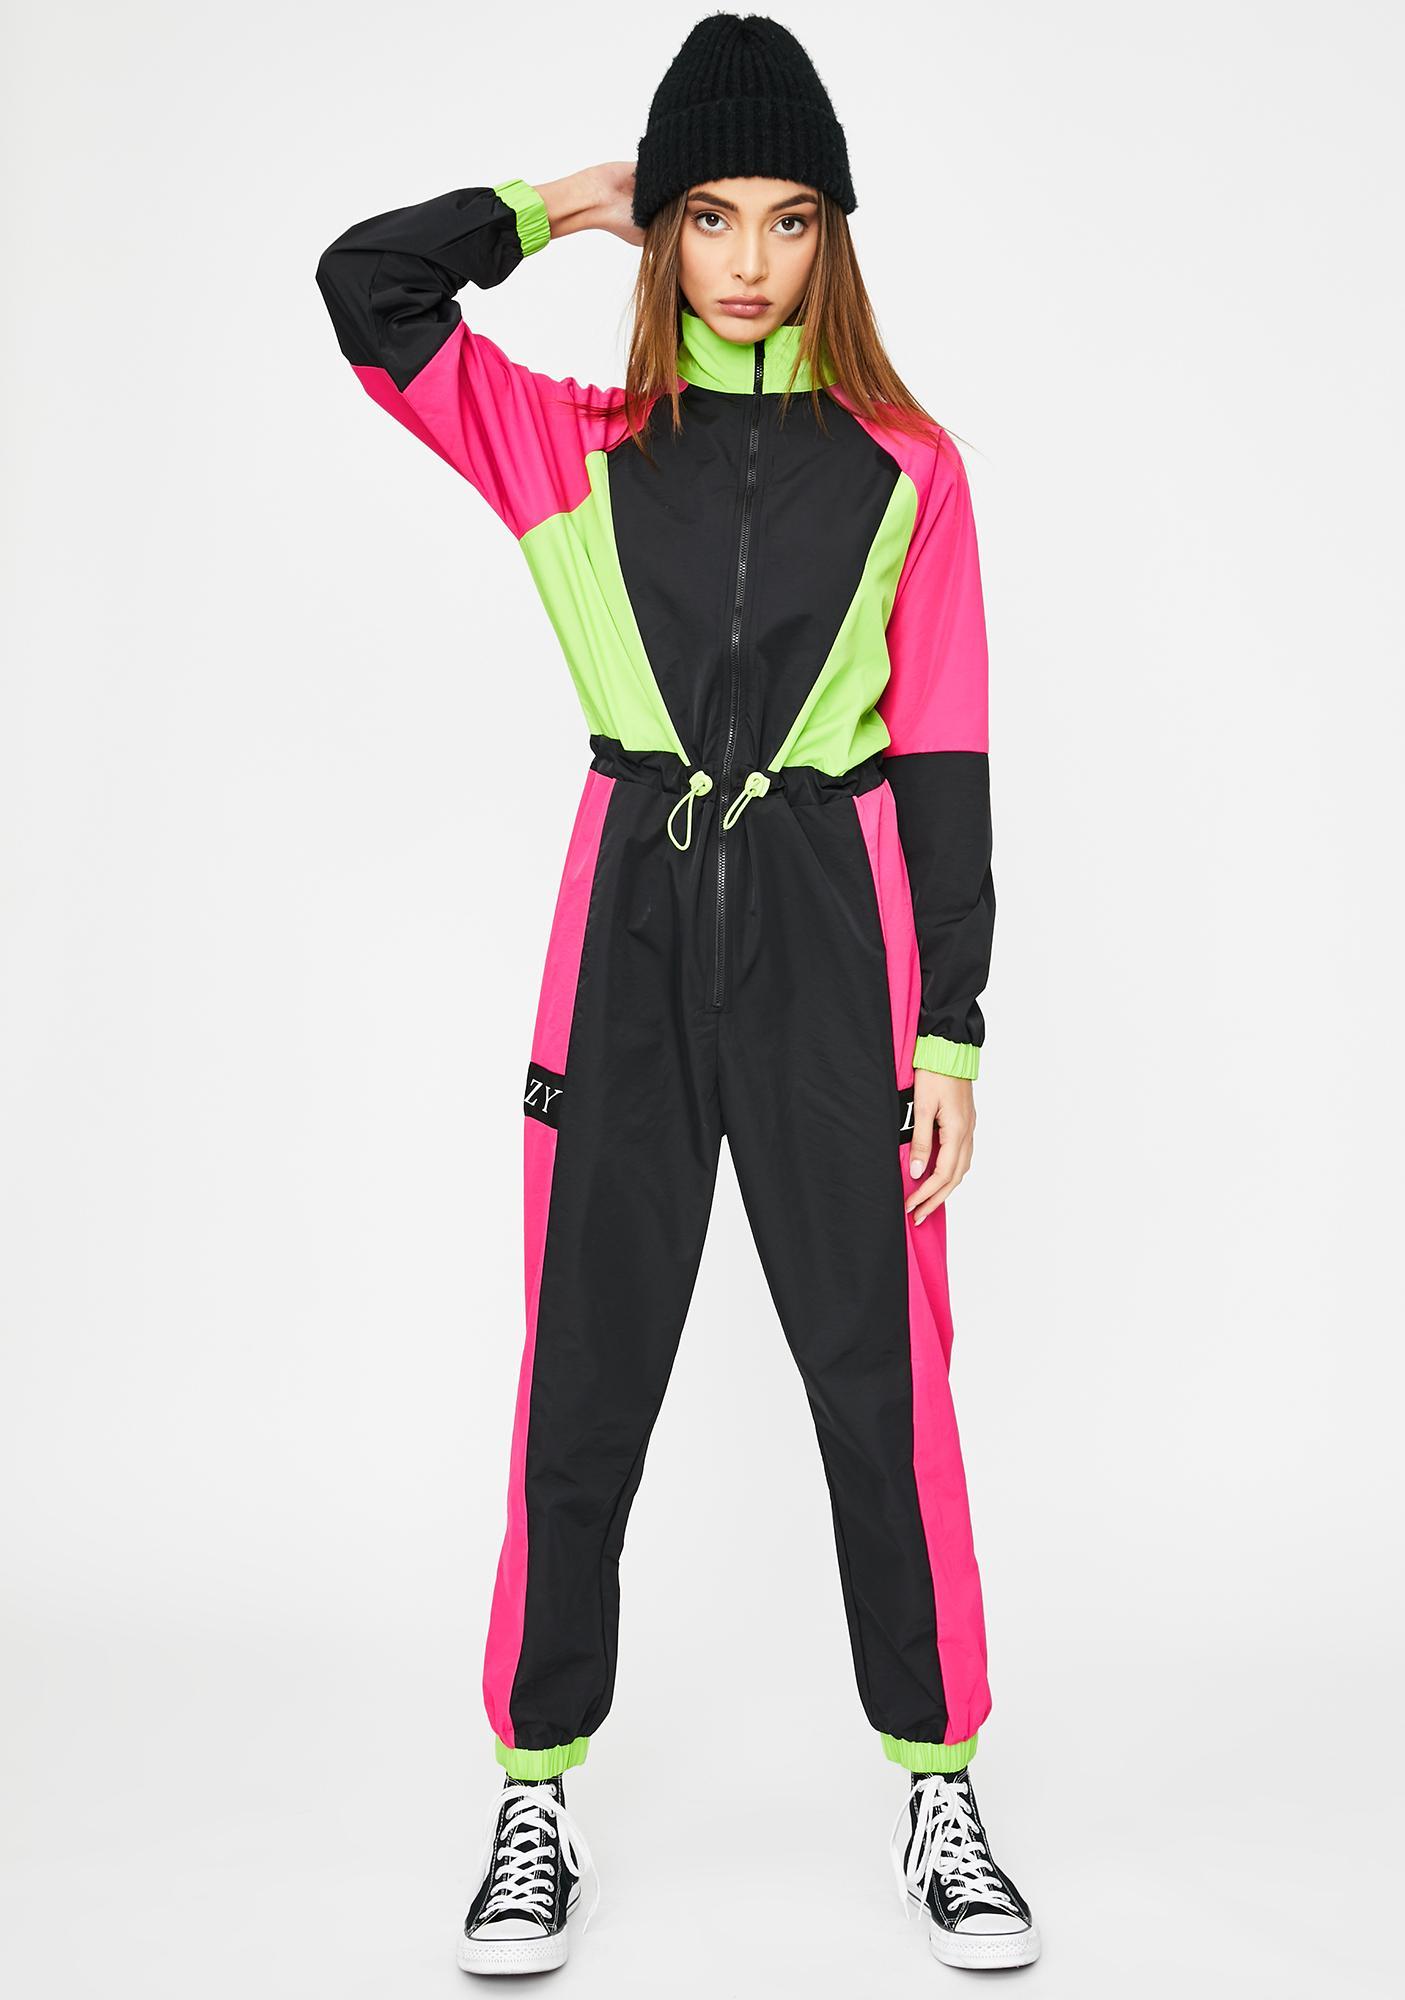 Lazy Oaf Looks Like Skiwear Jumpsuit